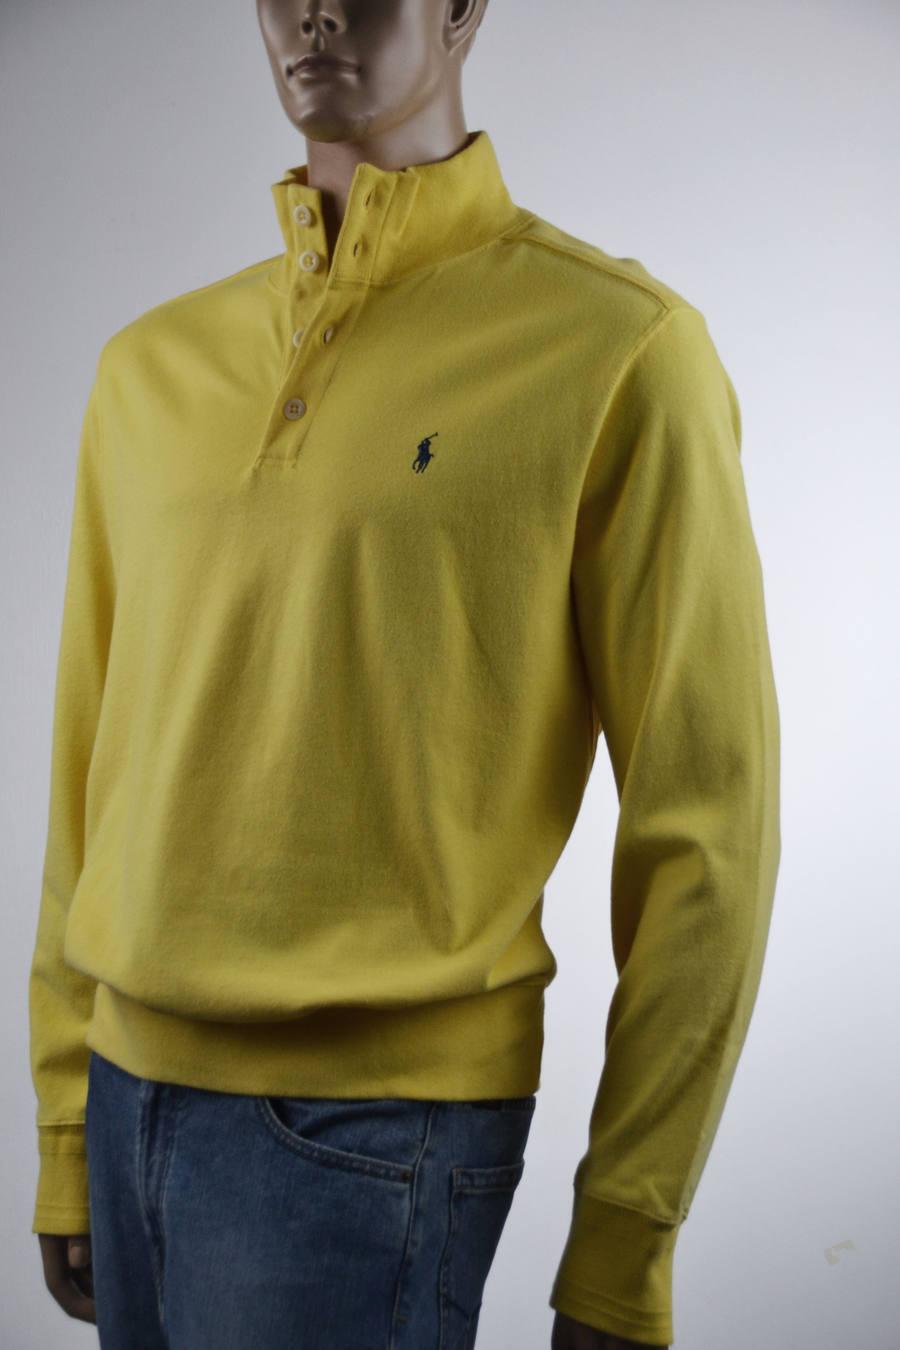 Ralph Lauren Gelb Half-Buttoned Cotton Sweater Sweatshirt  Pony -Xlarge-NWT